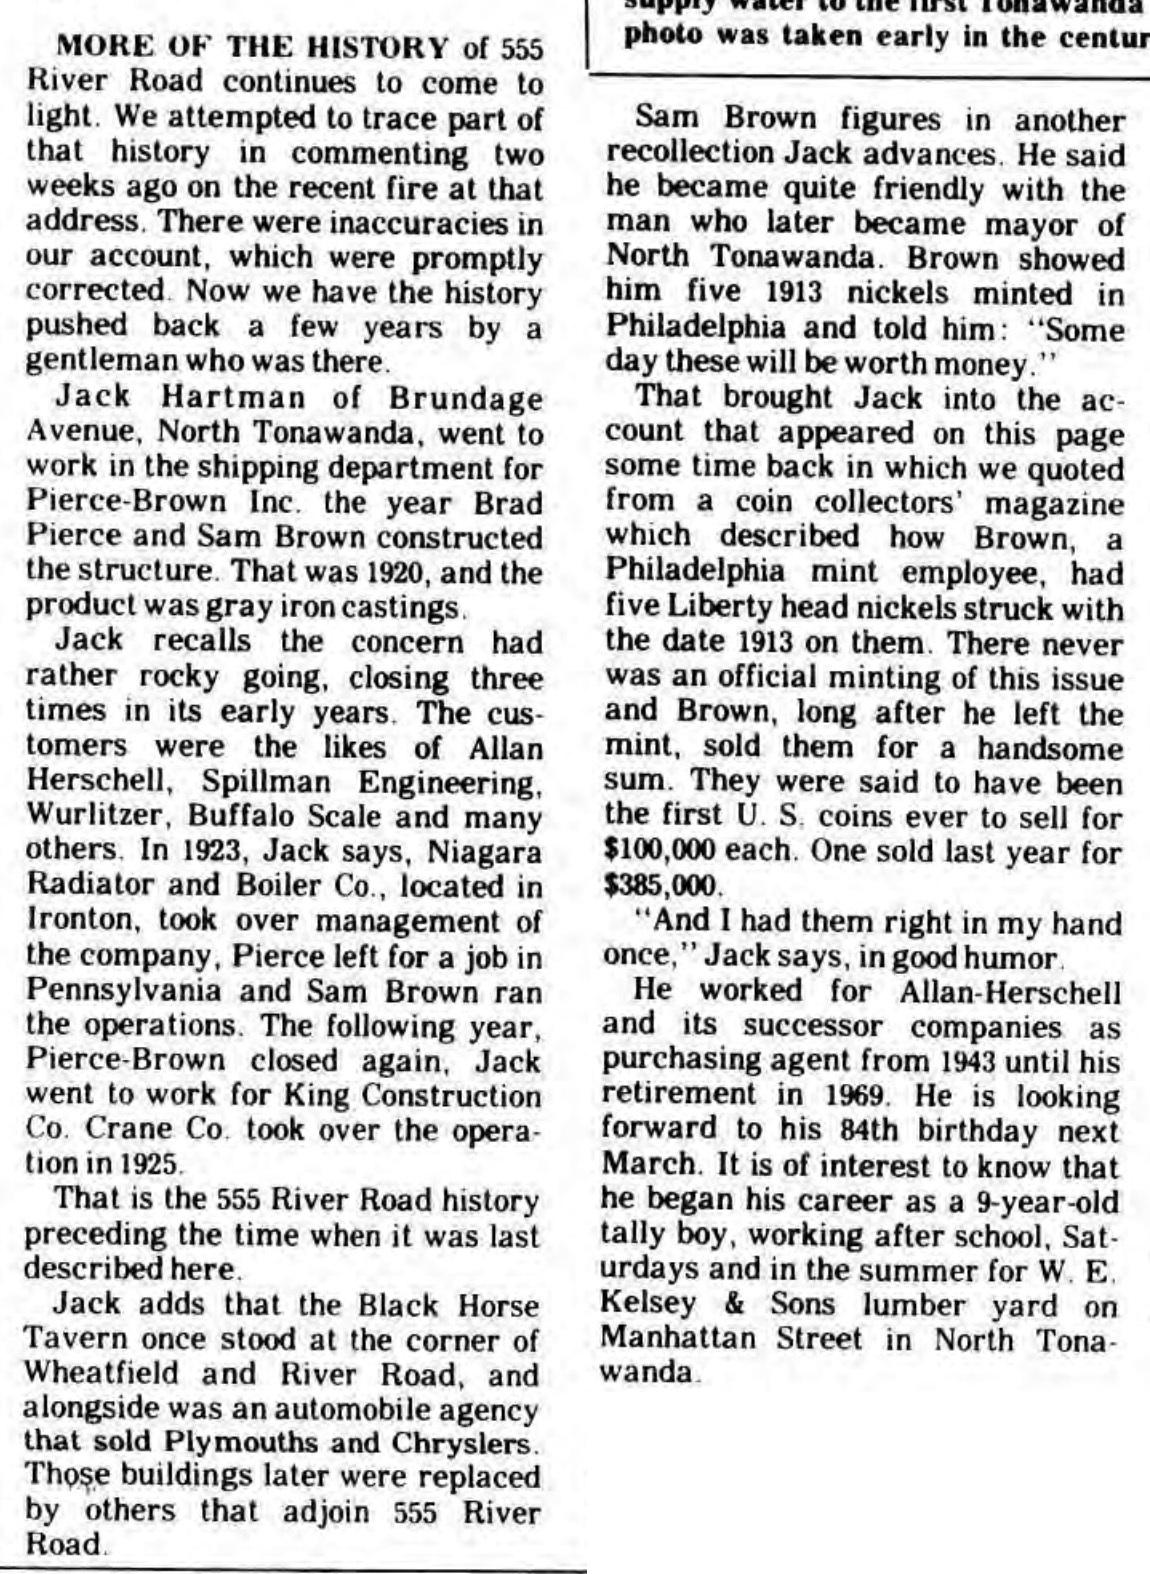 555 River history, second installment, article (Ton News, 1986) 6669.jpg